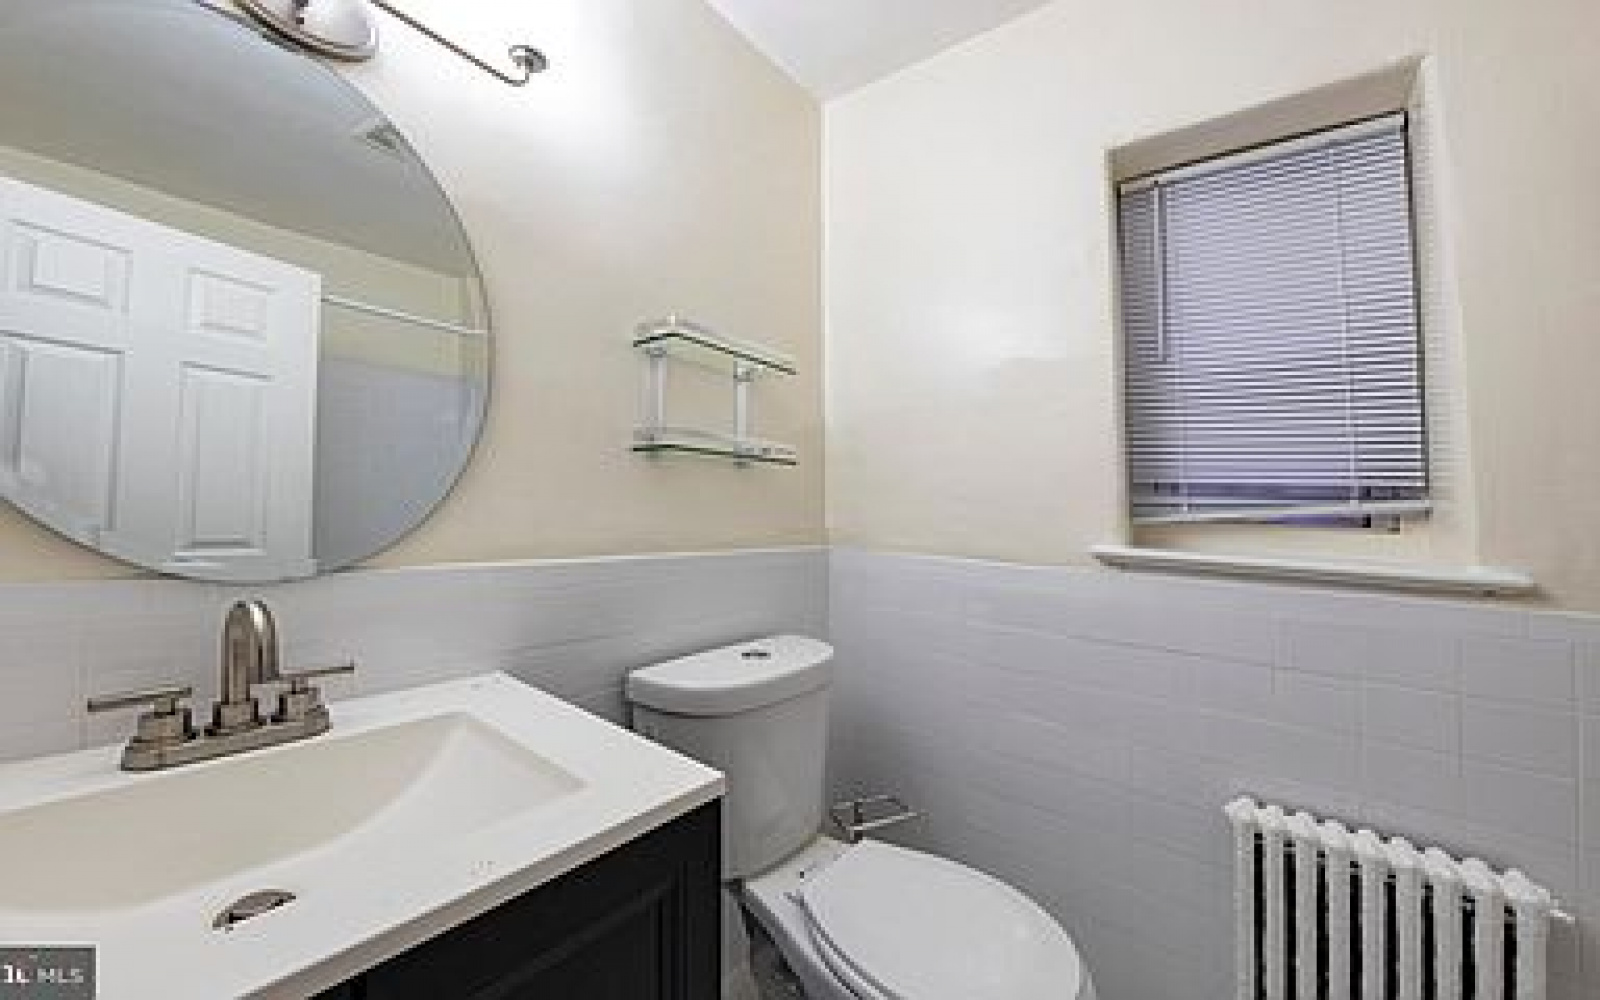 329 Delafield,Washington,District Of Columbia 20011,2 Bedrooms Bedrooms,1 BathroomBathrooms,Apartment,Delafield,1201